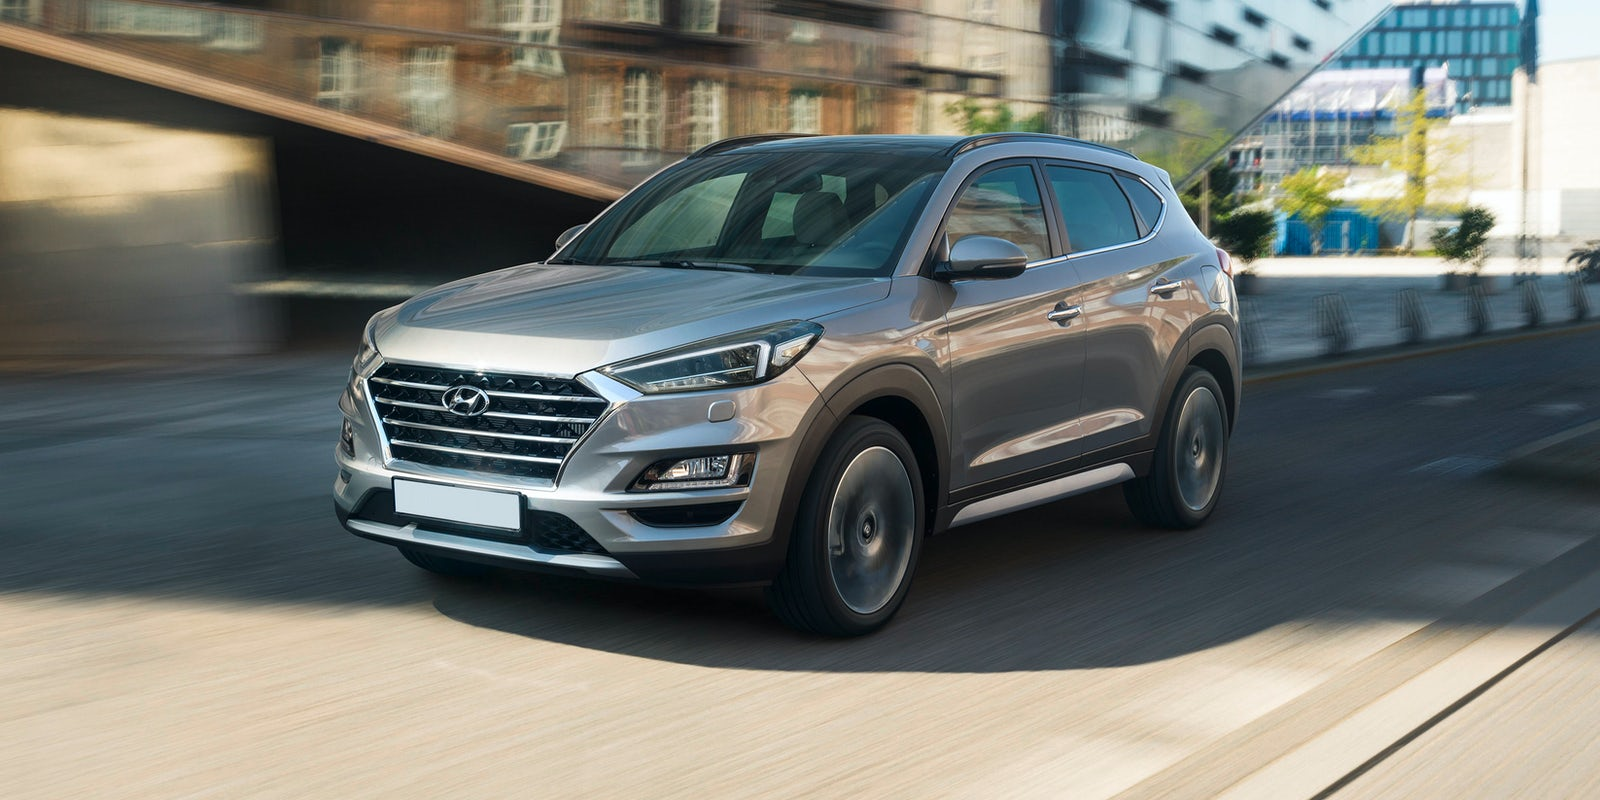 New Hyundai Tucson Review | carwow